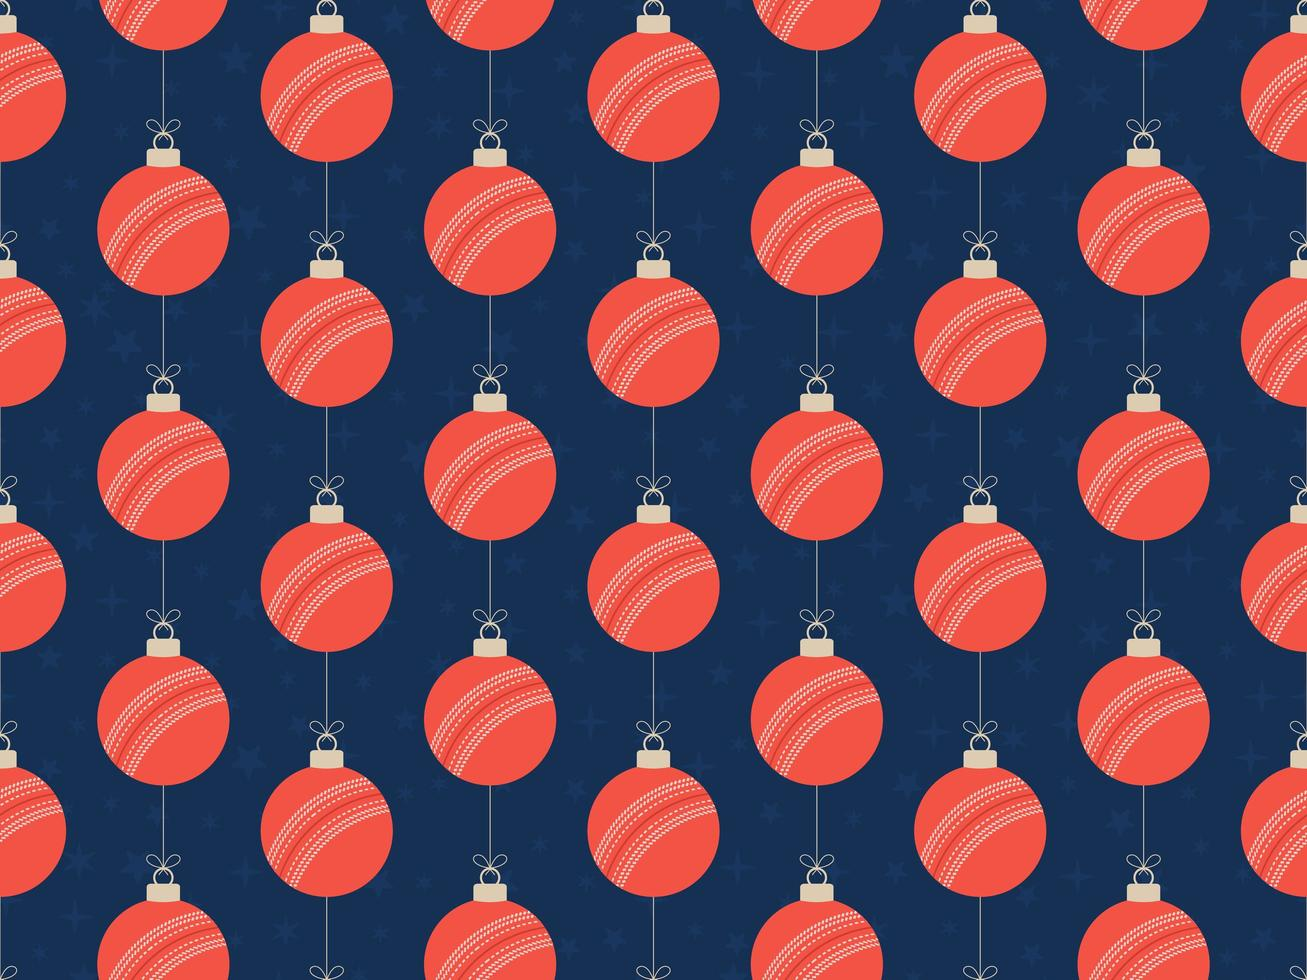 Frohe Weihnachten Cricketball nahtlose horizontale Muster vektor